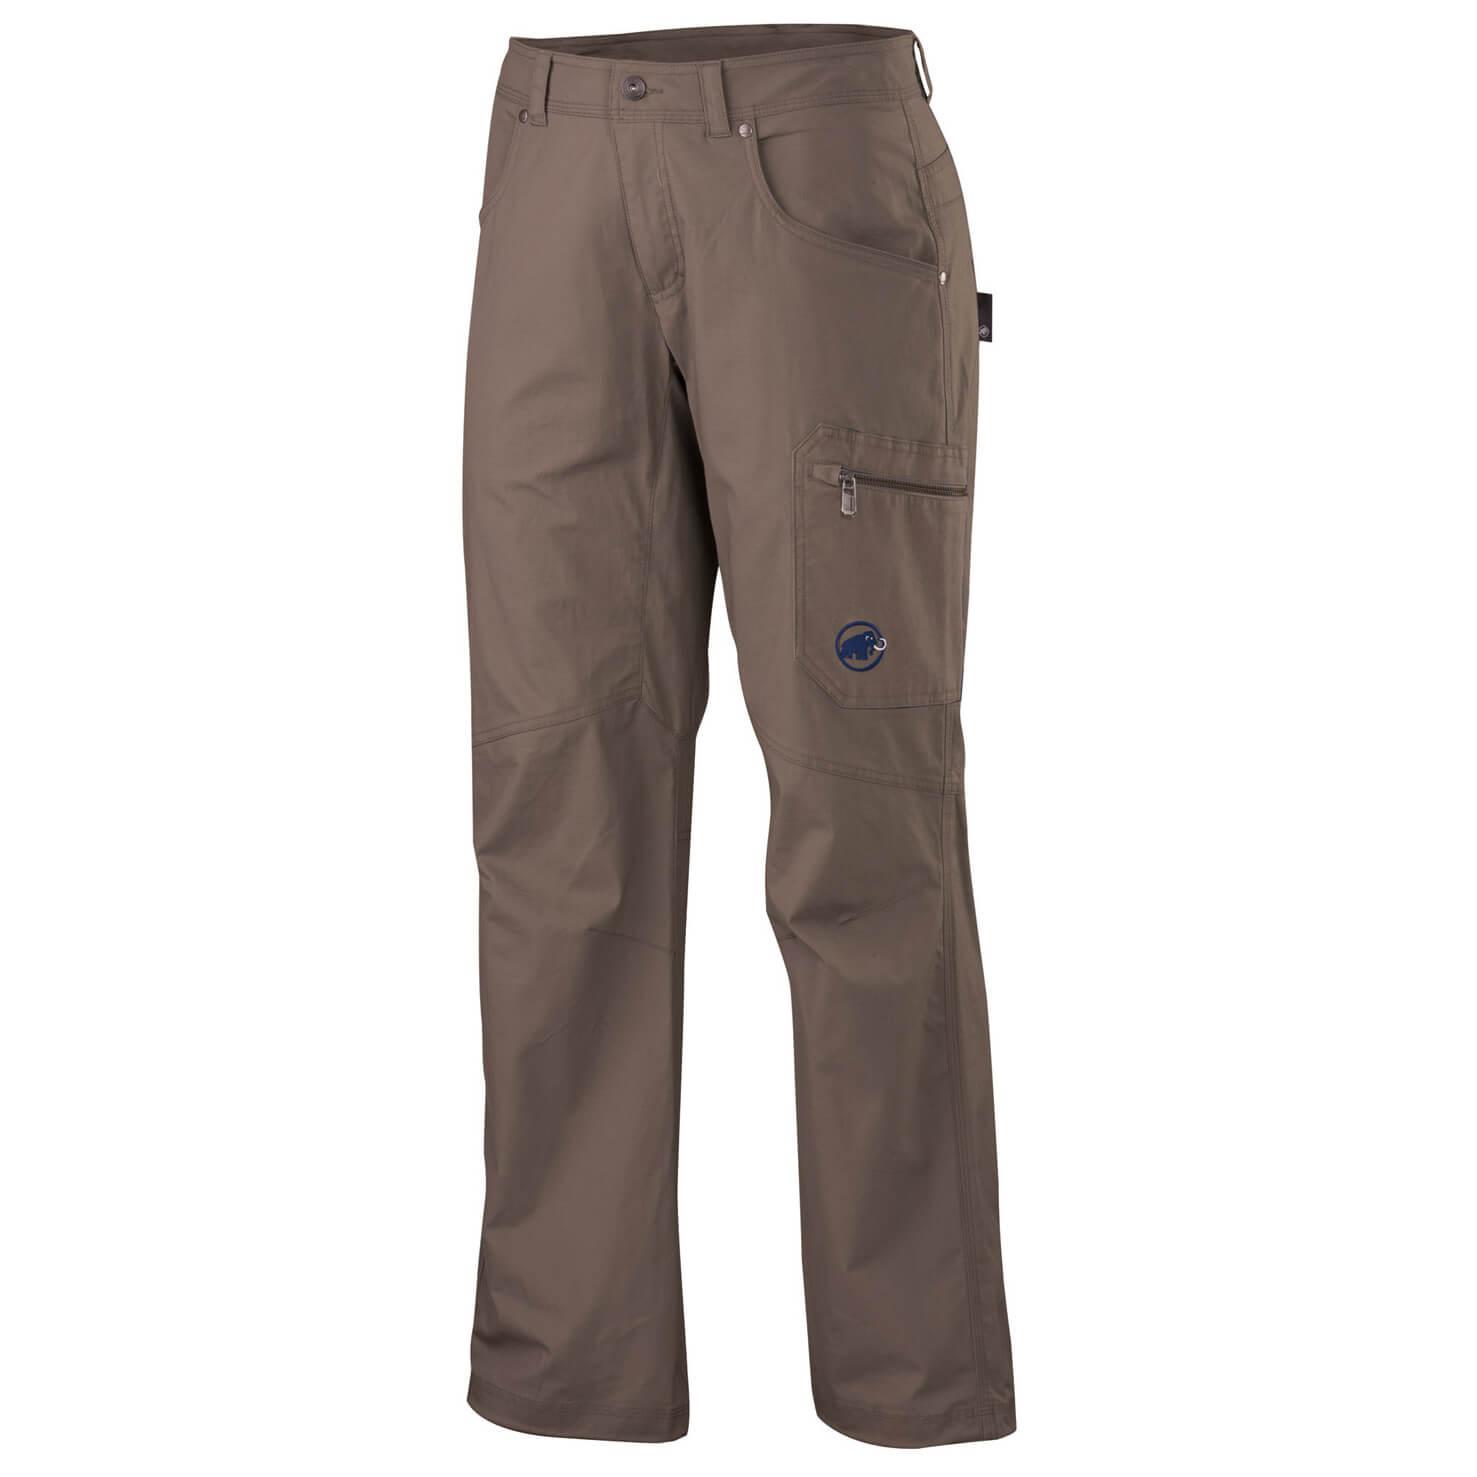 Mammut El Cap Pants Climbing Pant Men S Buy Online